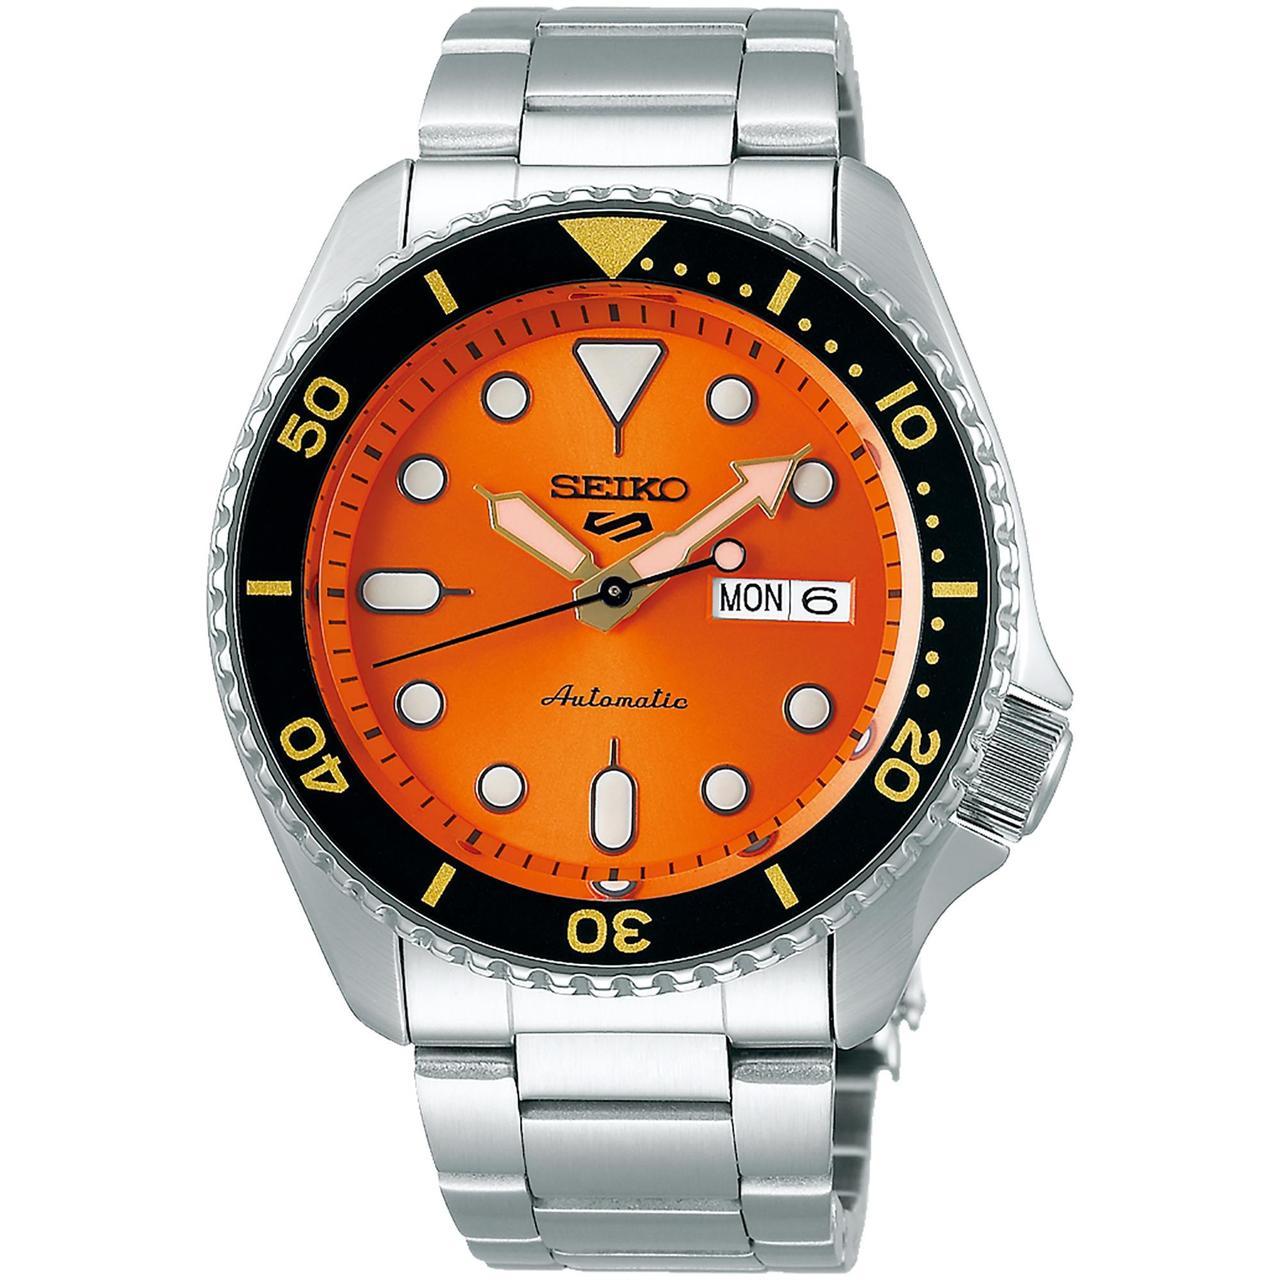 Часы Seiko 5 Sports SRPD59K1 Automatic 4R36.